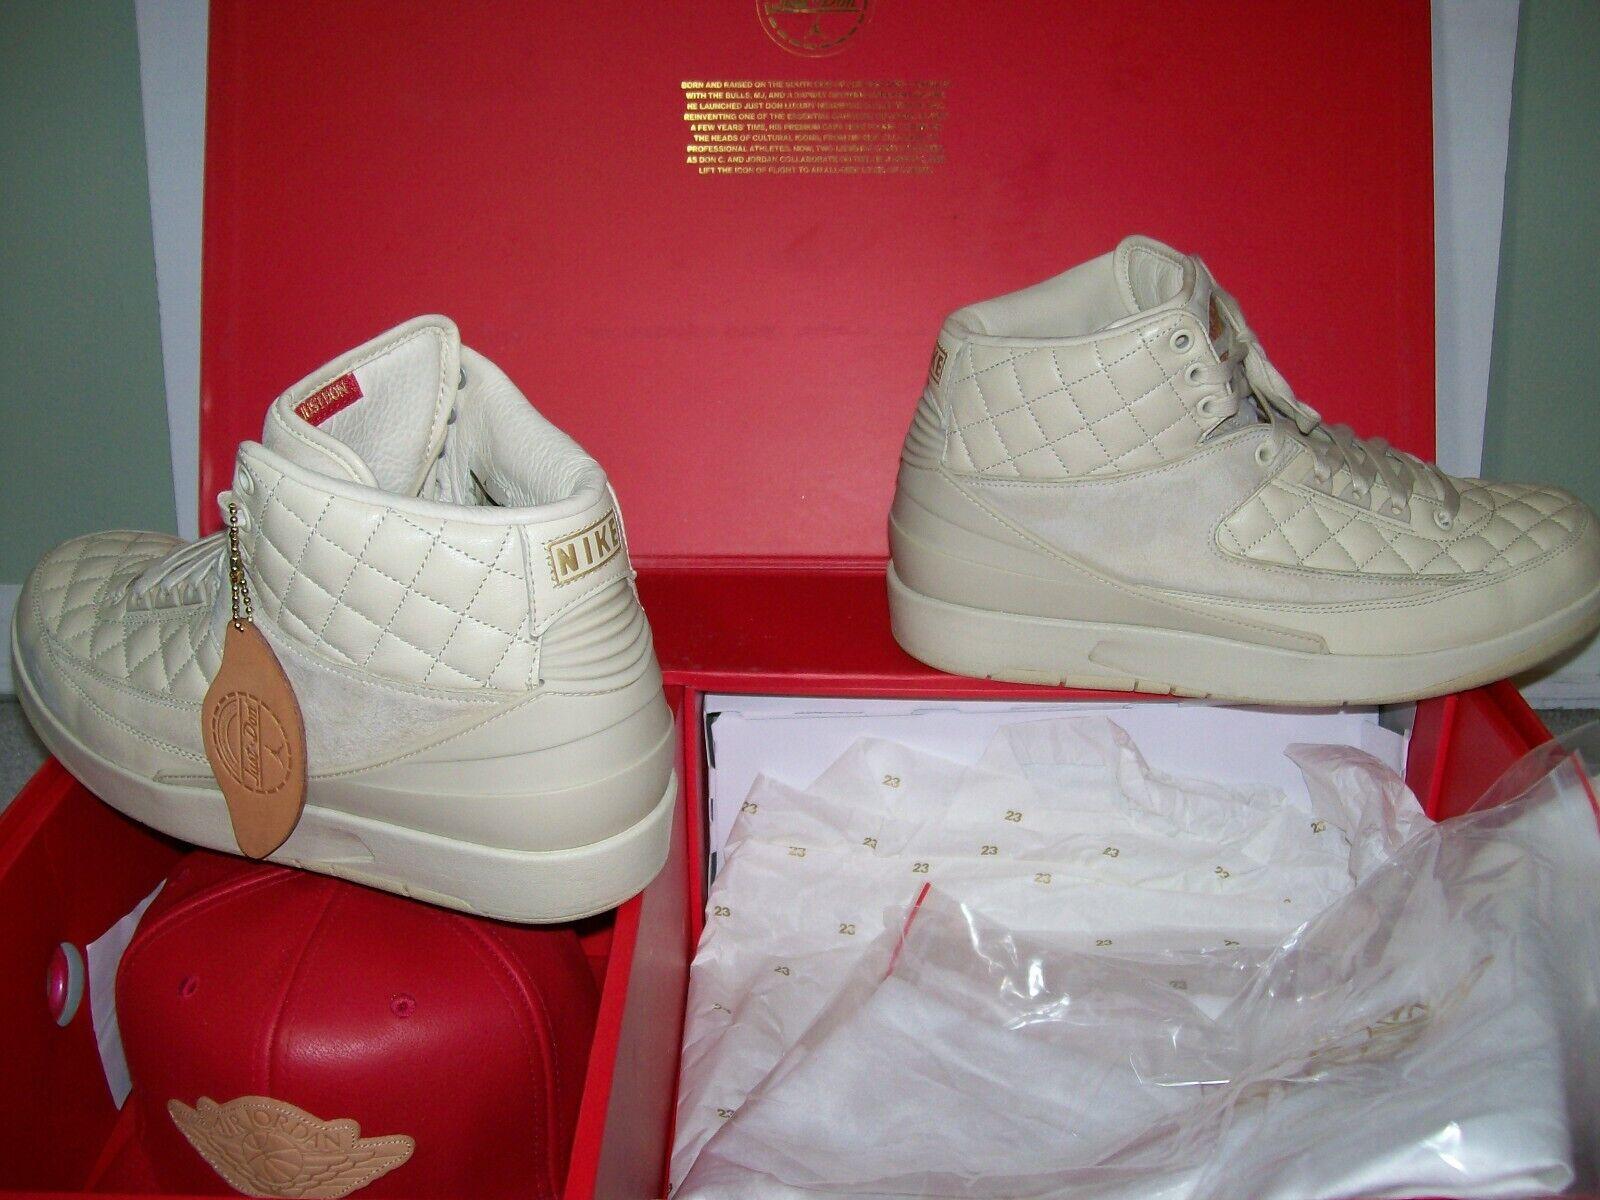 Nike Air Jordan 2 II Retro Just Don